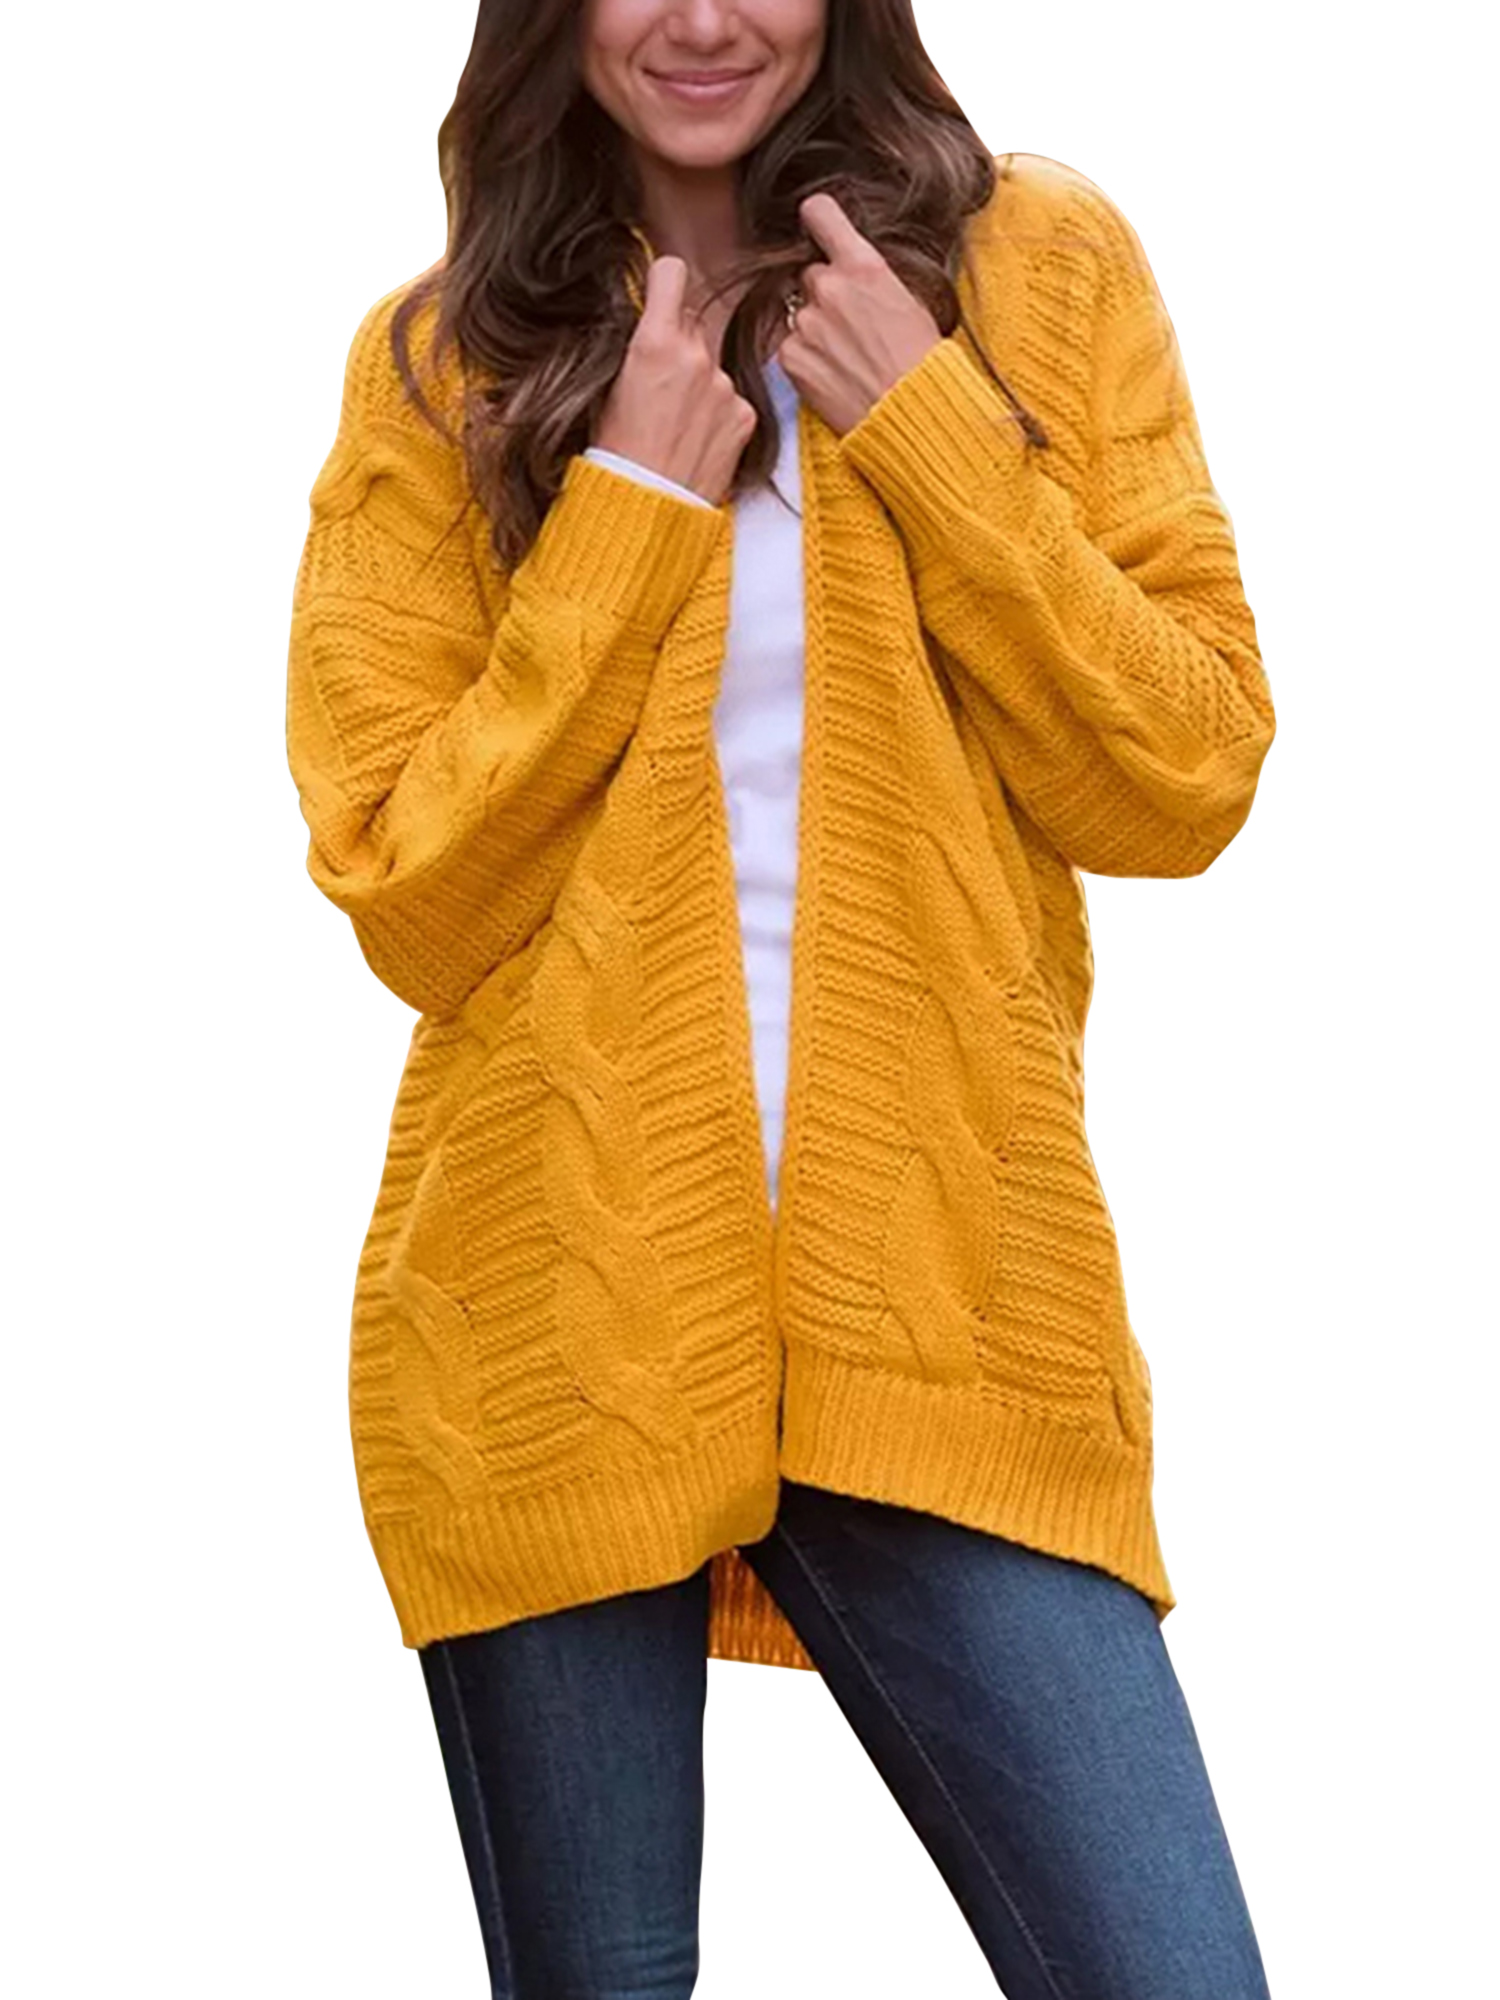 Baby Girls Winter Long Sleeve Cardigan Jumper Sweater Fall Knit Jacket Top KE